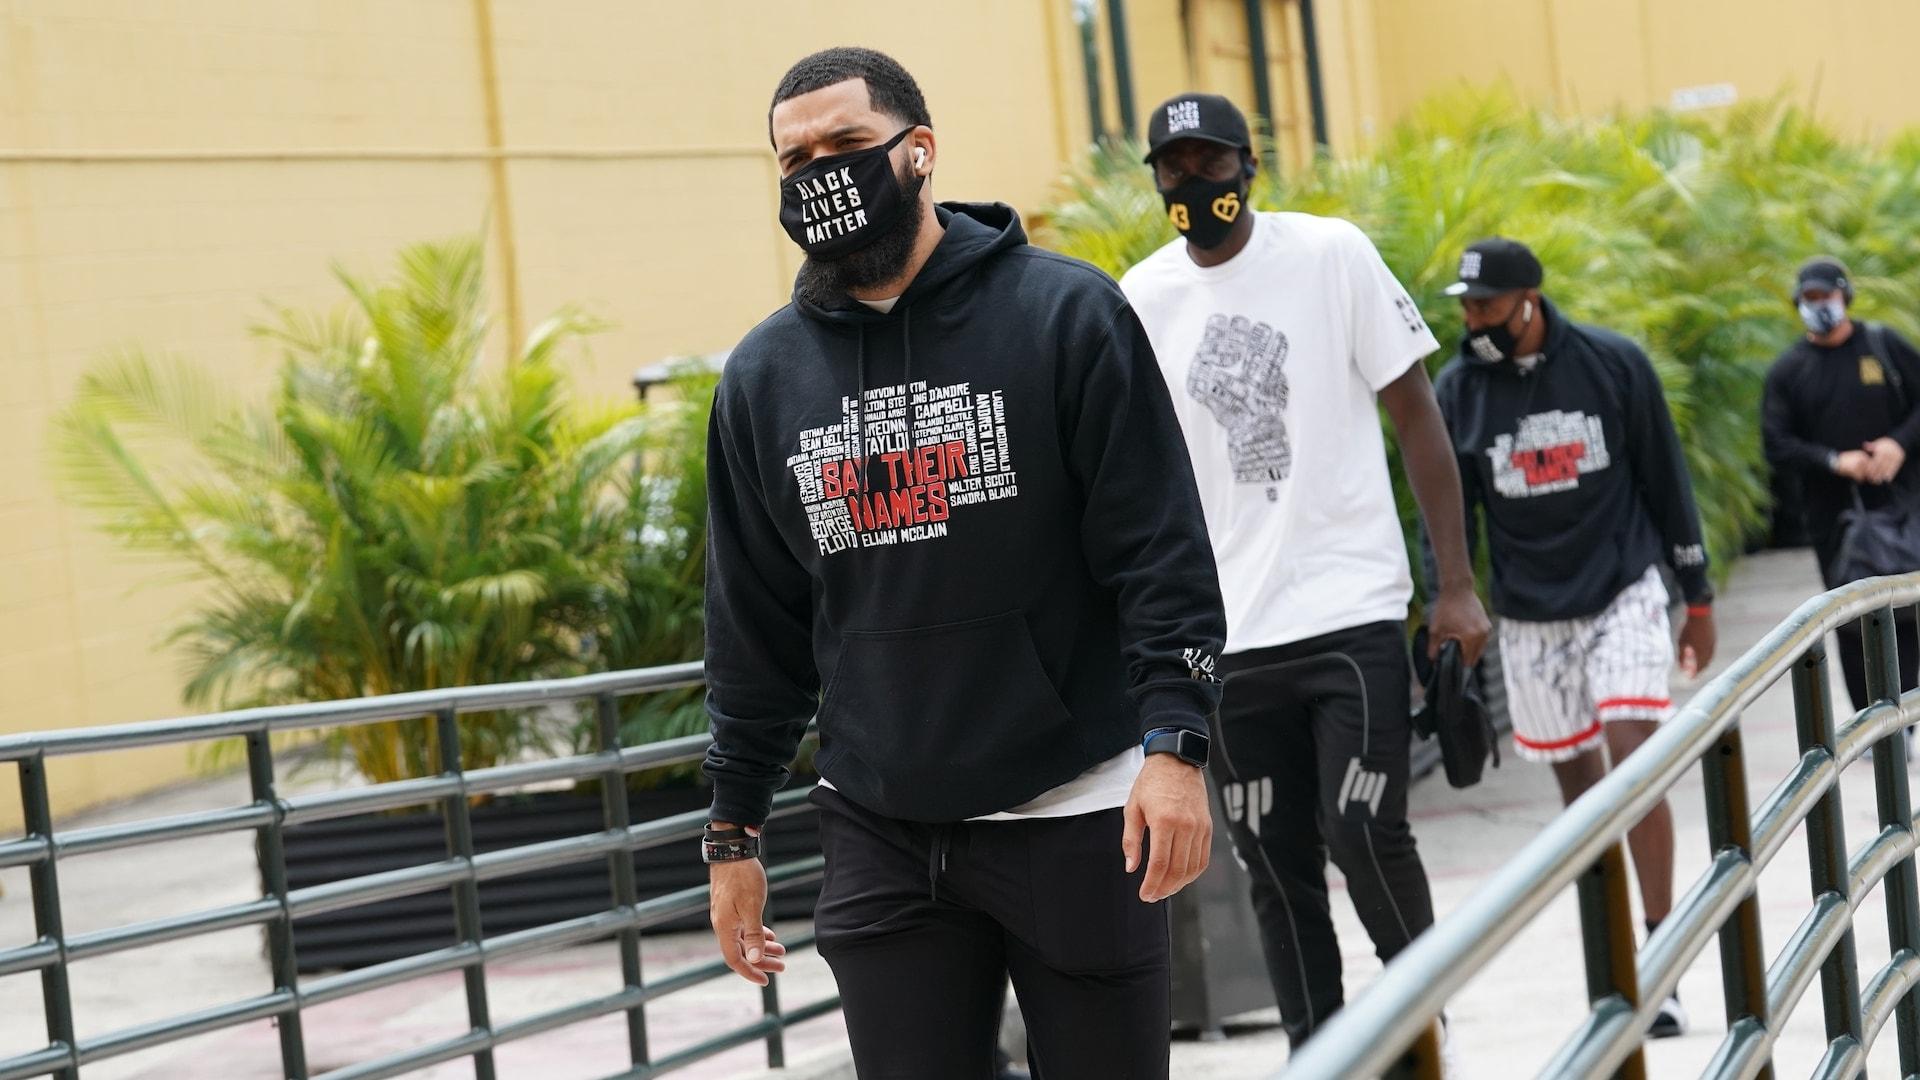 Raptors pause basketball talk after Jacob Blake shooting